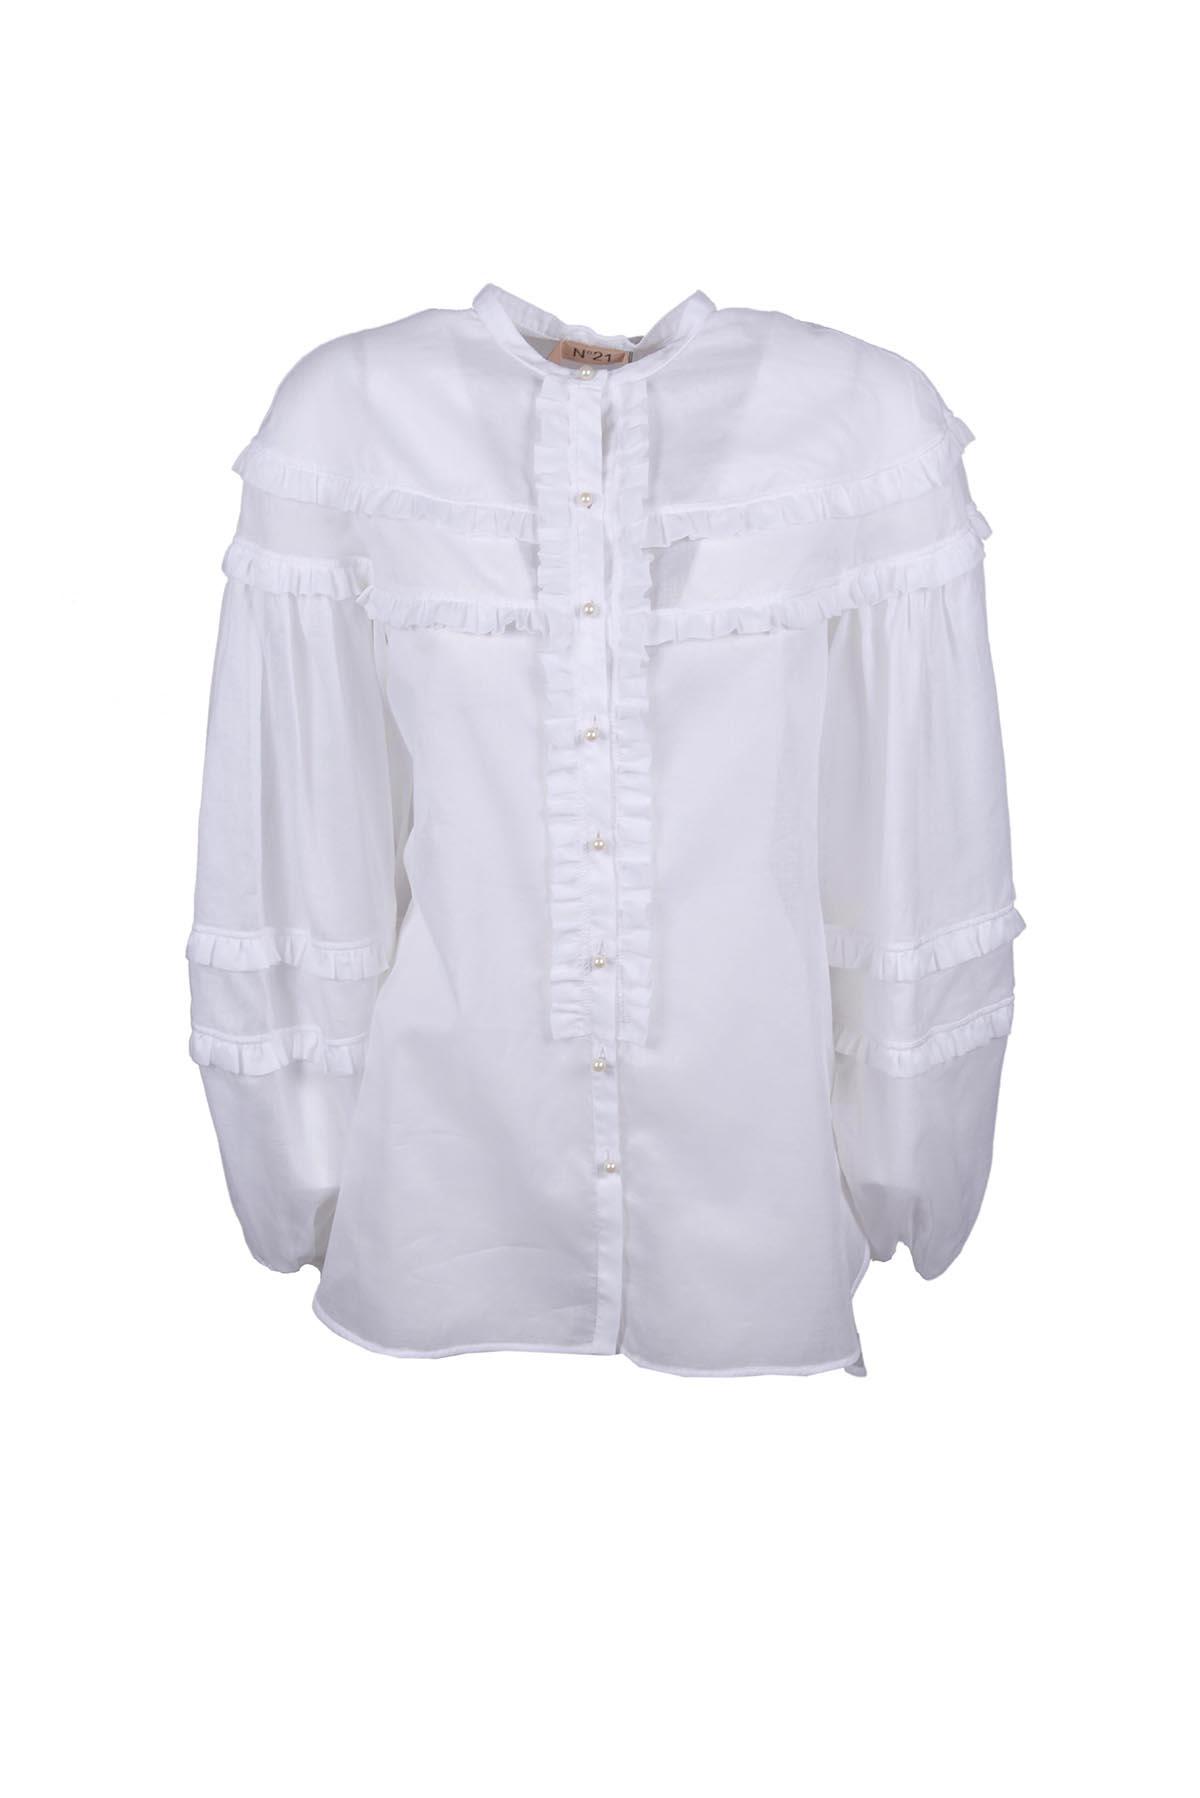 N.21 Shirt